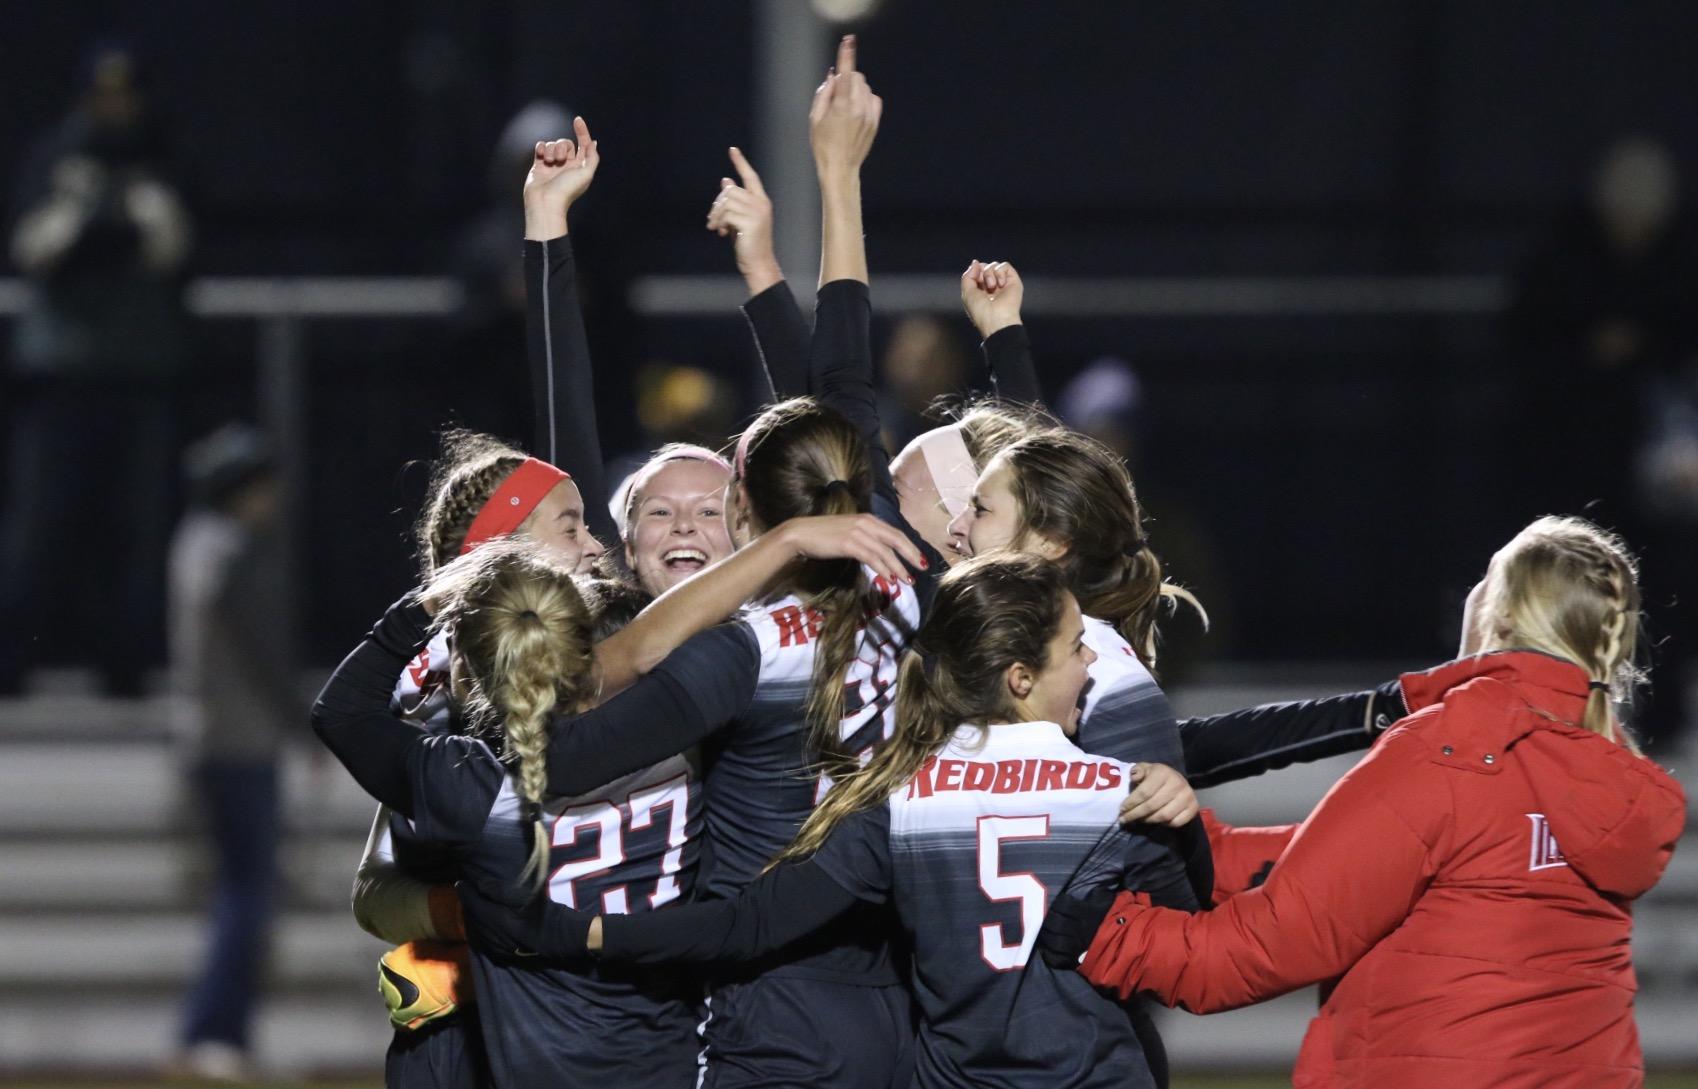 Women soccer players celebrating